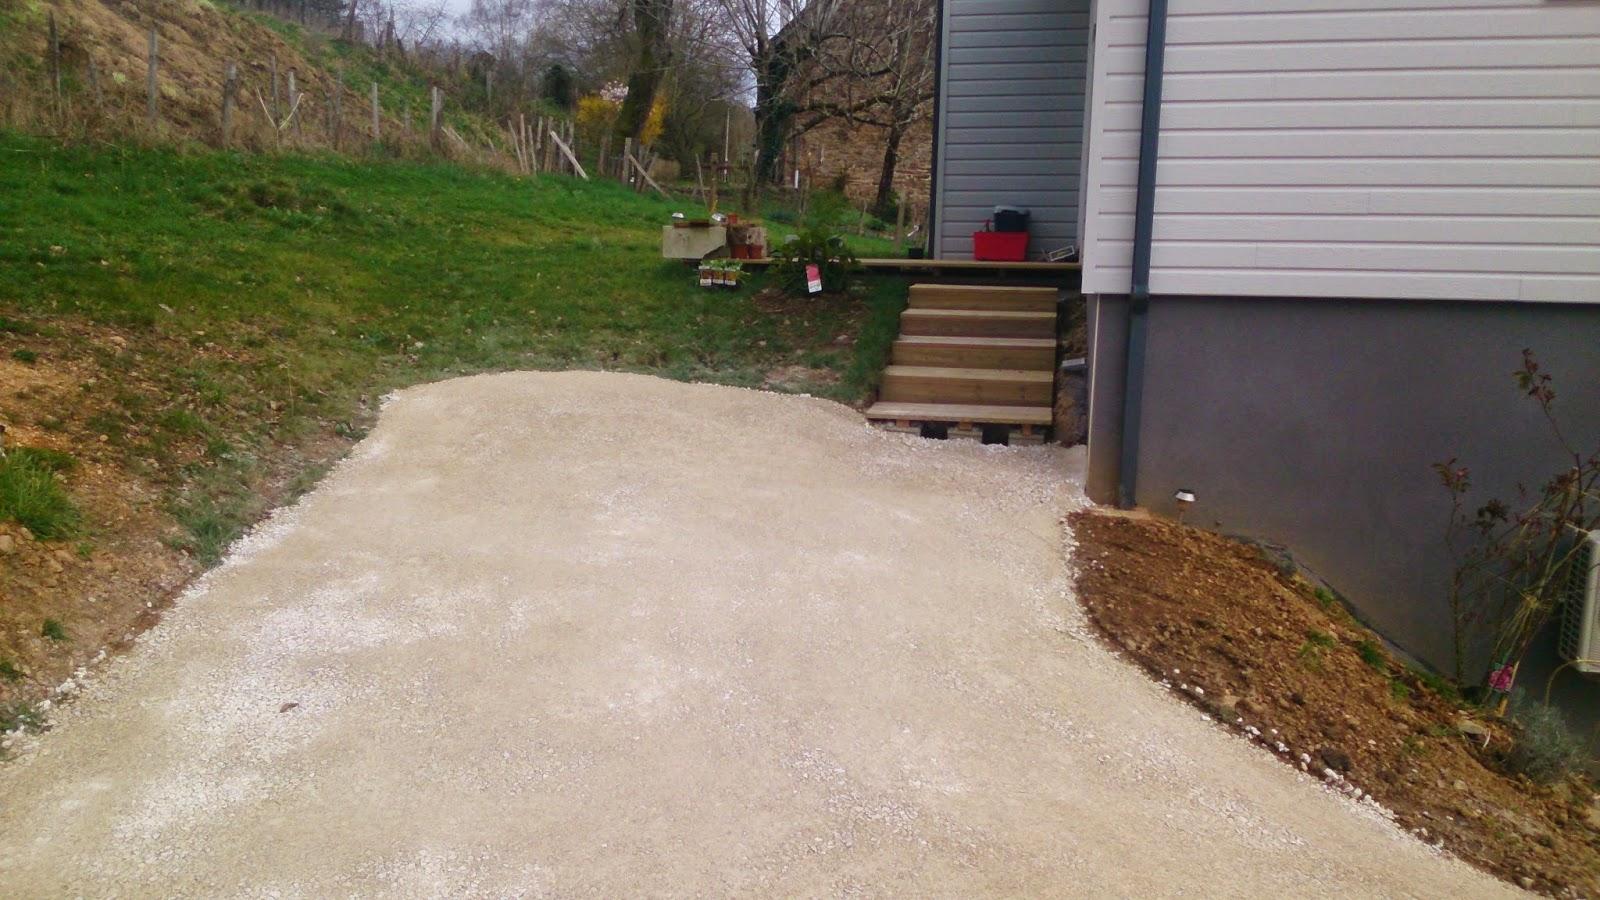 le jardin de nils le projet de la descente de garage. Black Bedroom Furniture Sets. Home Design Ideas